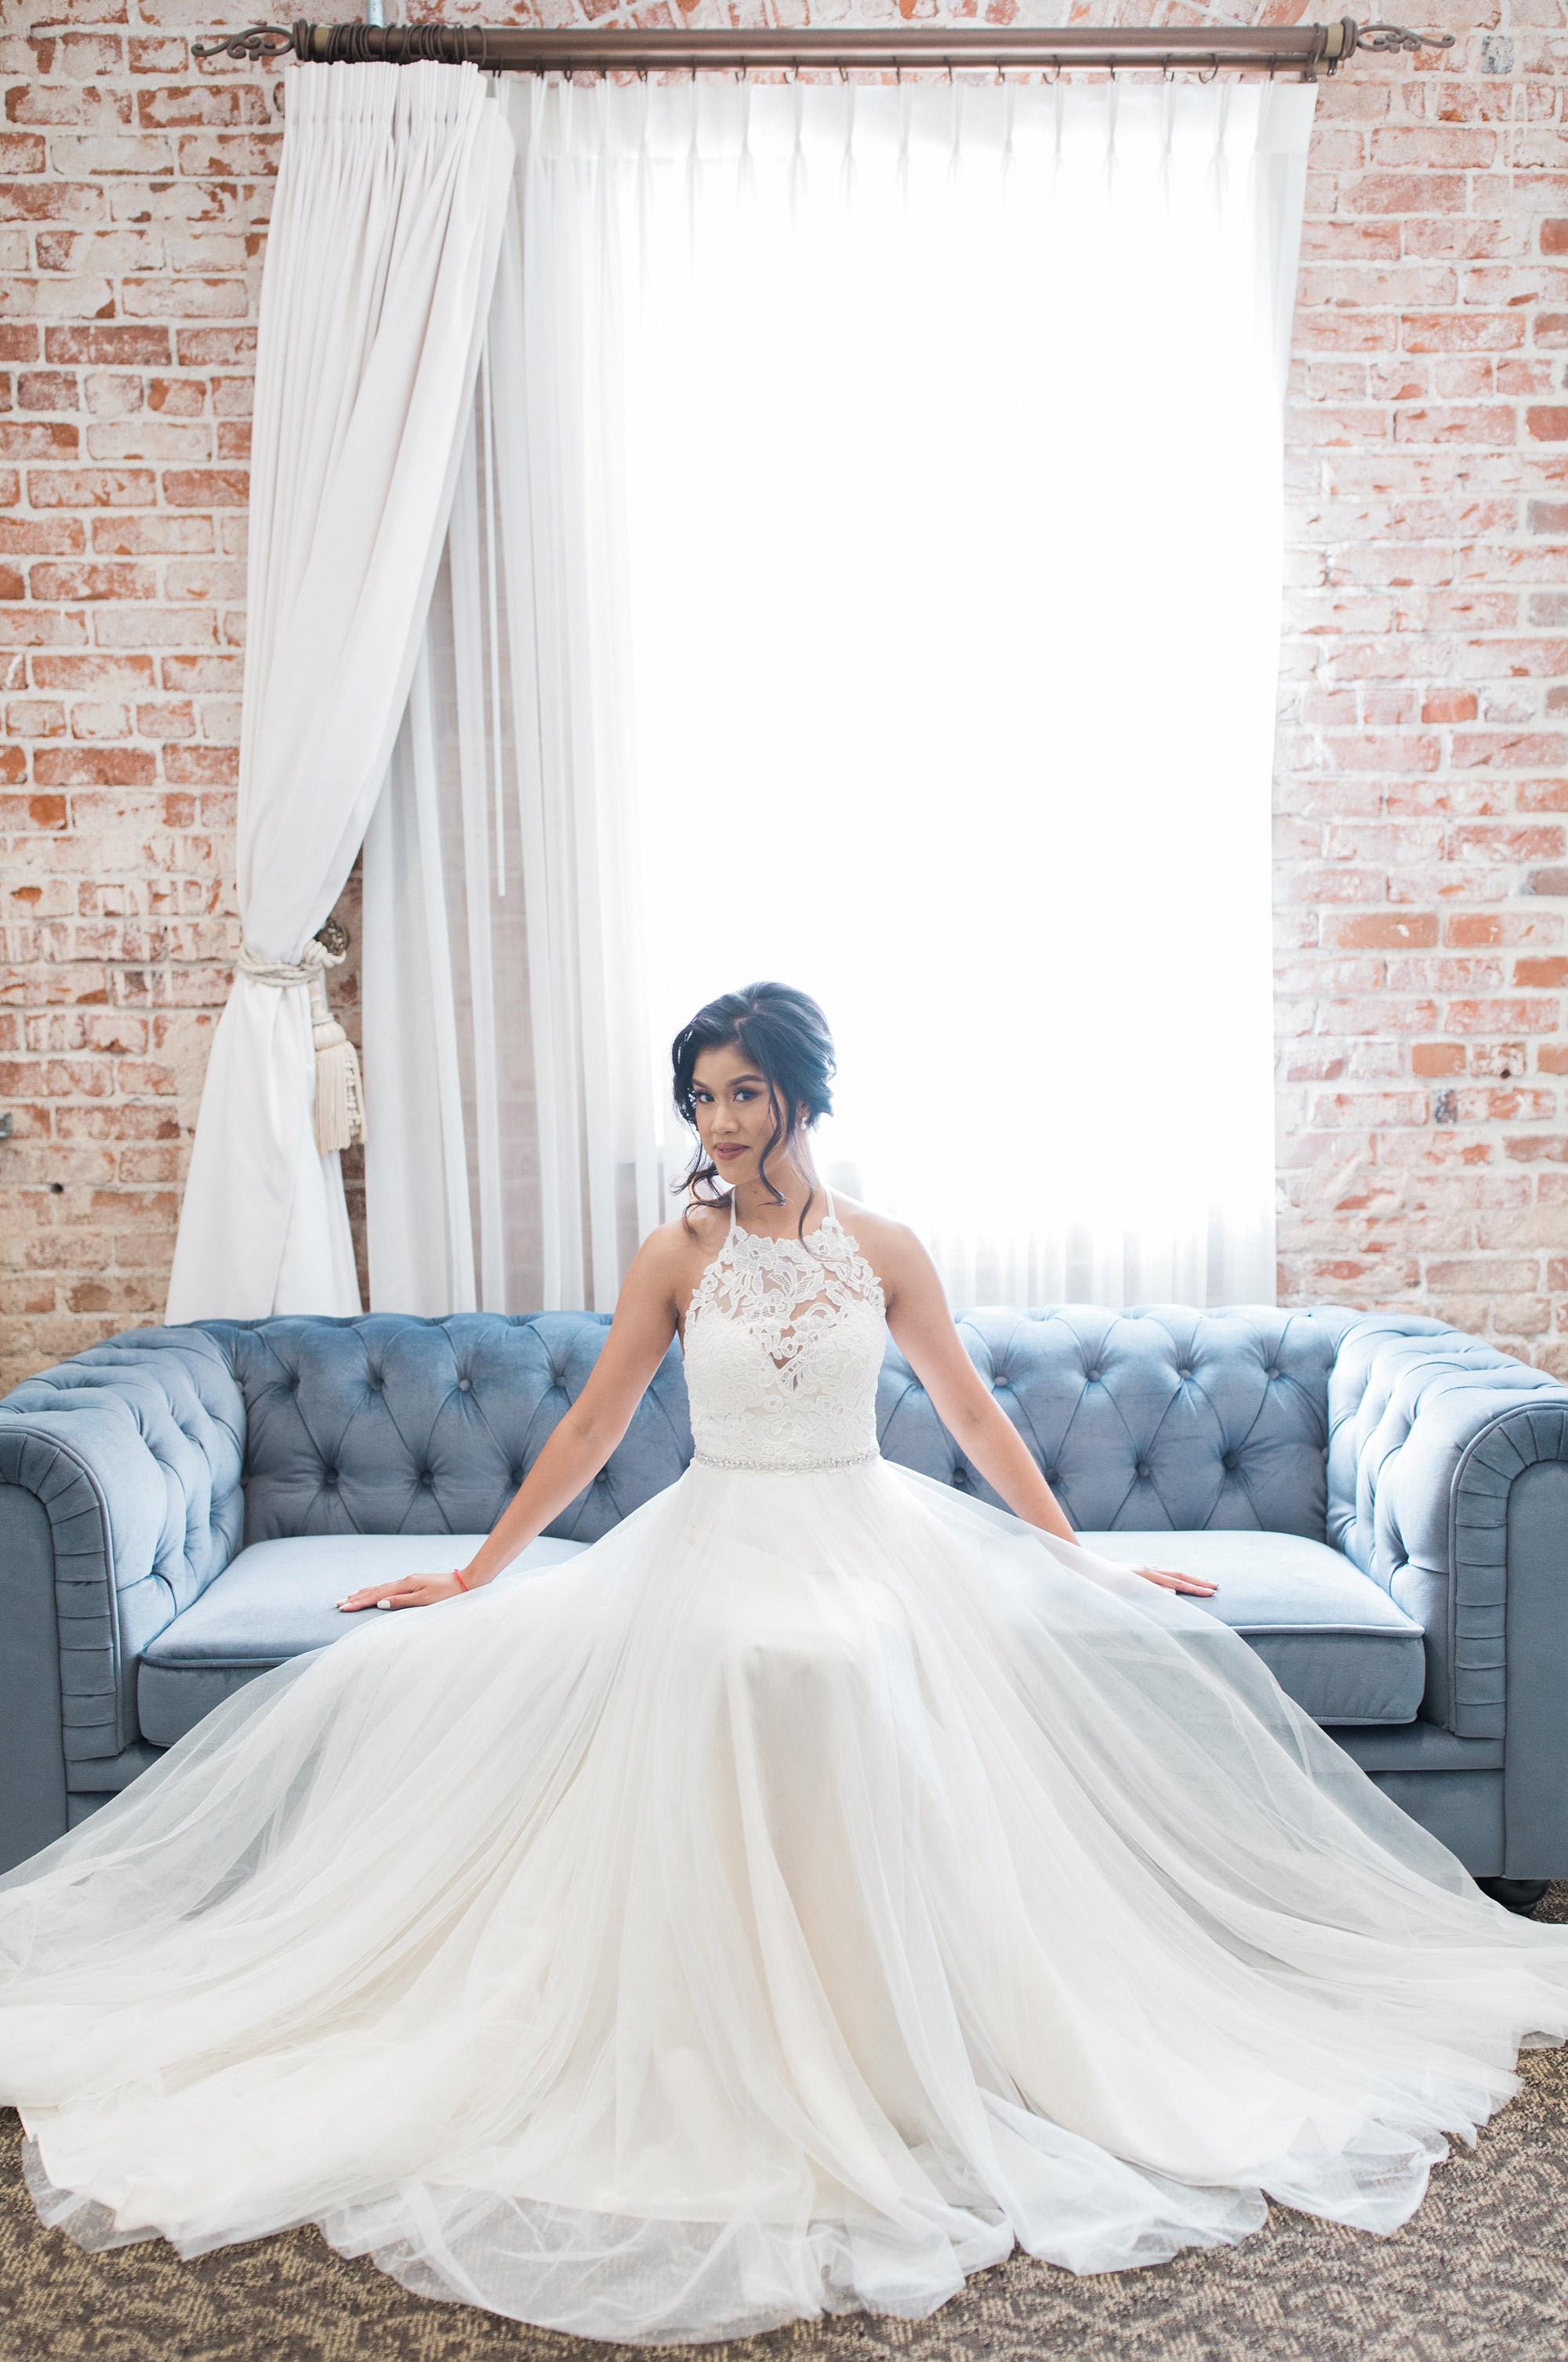 Estate on Second Wedding Photographer Leah Vis 8.jpg